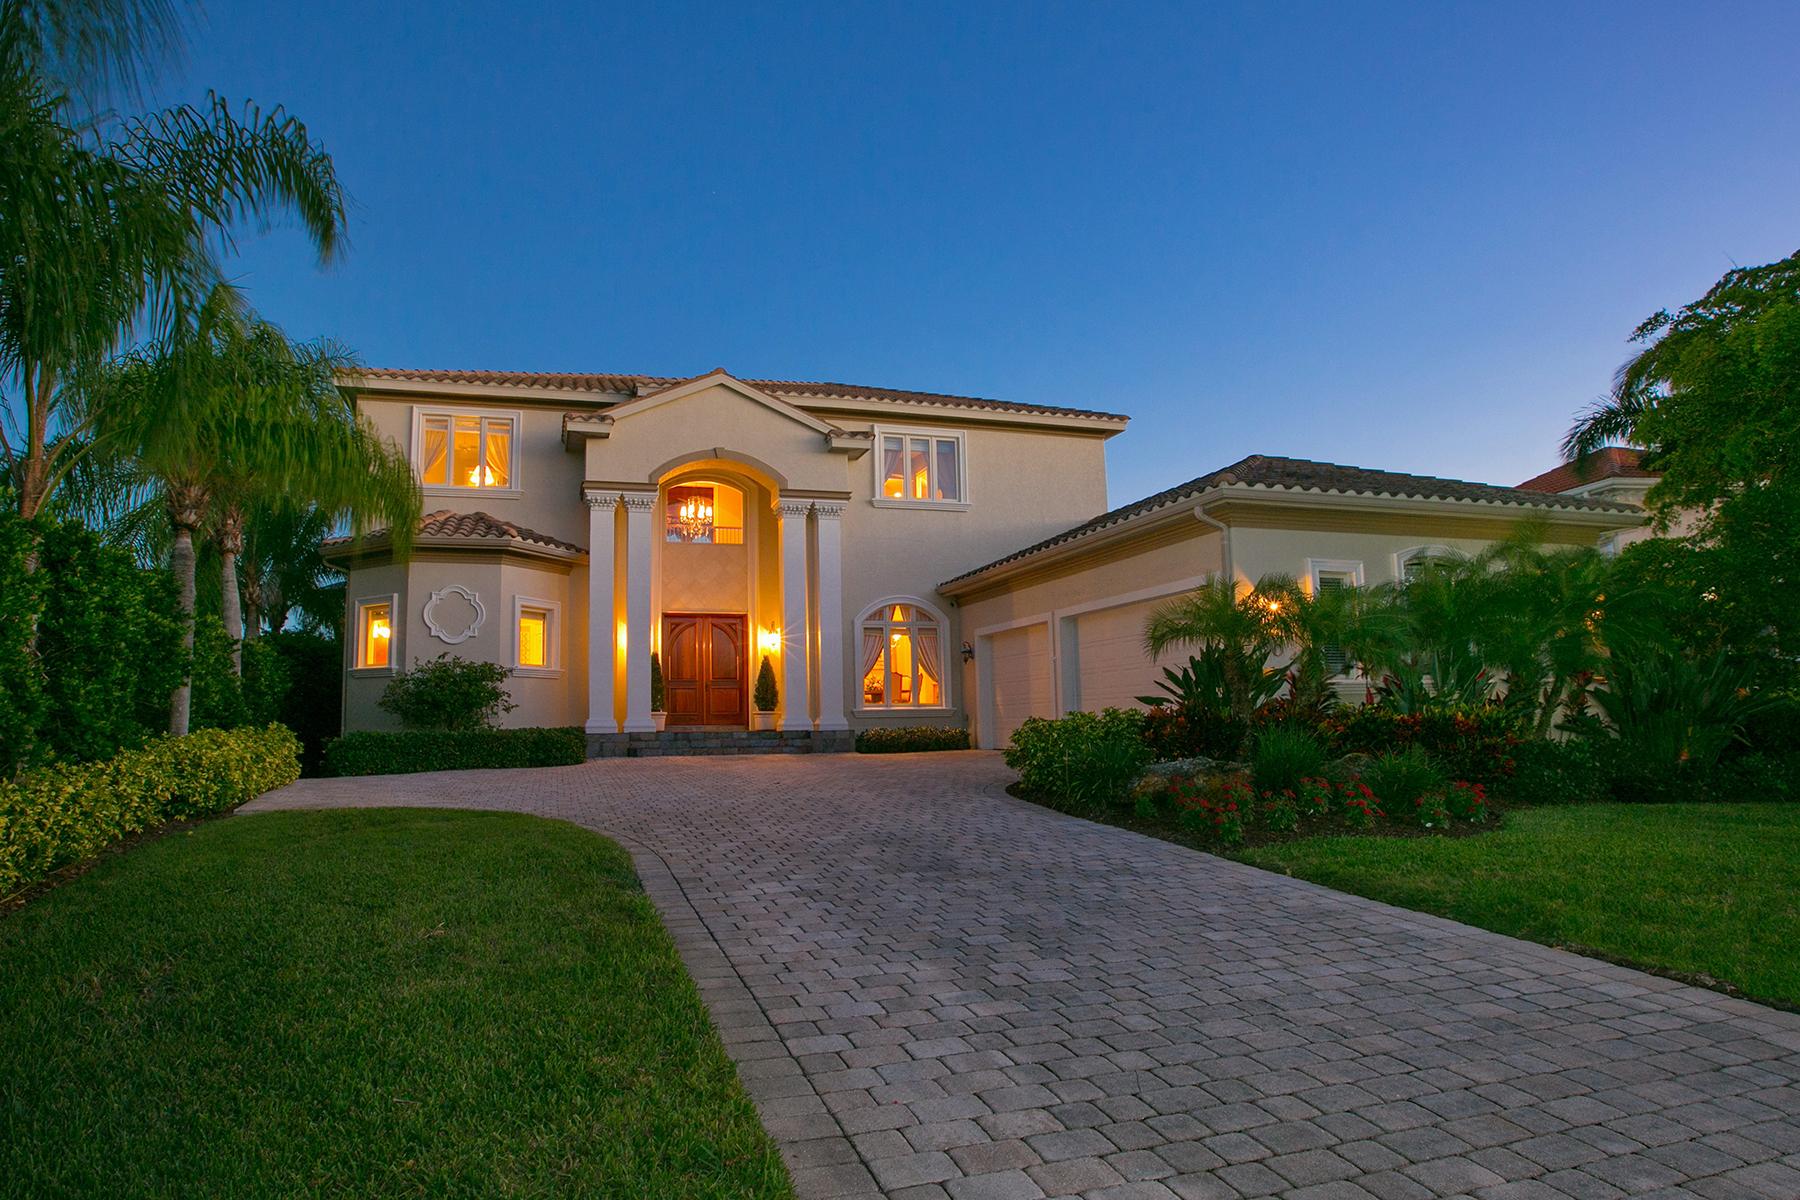 Casa Unifamiliar por un Venta en CORAL COVE 1604 Caribbean Dr Sarasota, Florida 34231 Estados Unidos